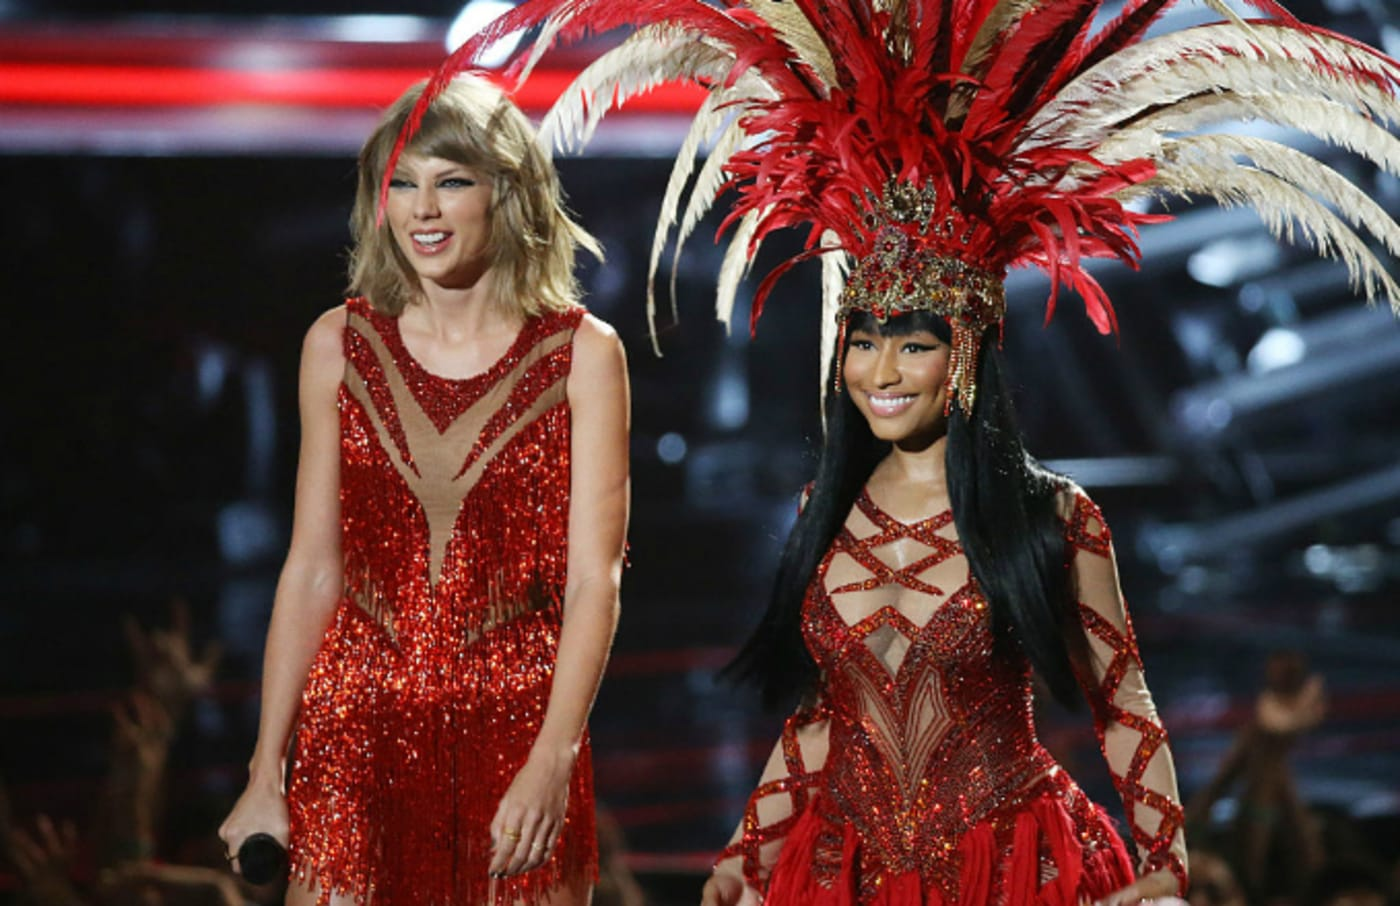 Nicki Minaj and Taylor Swift